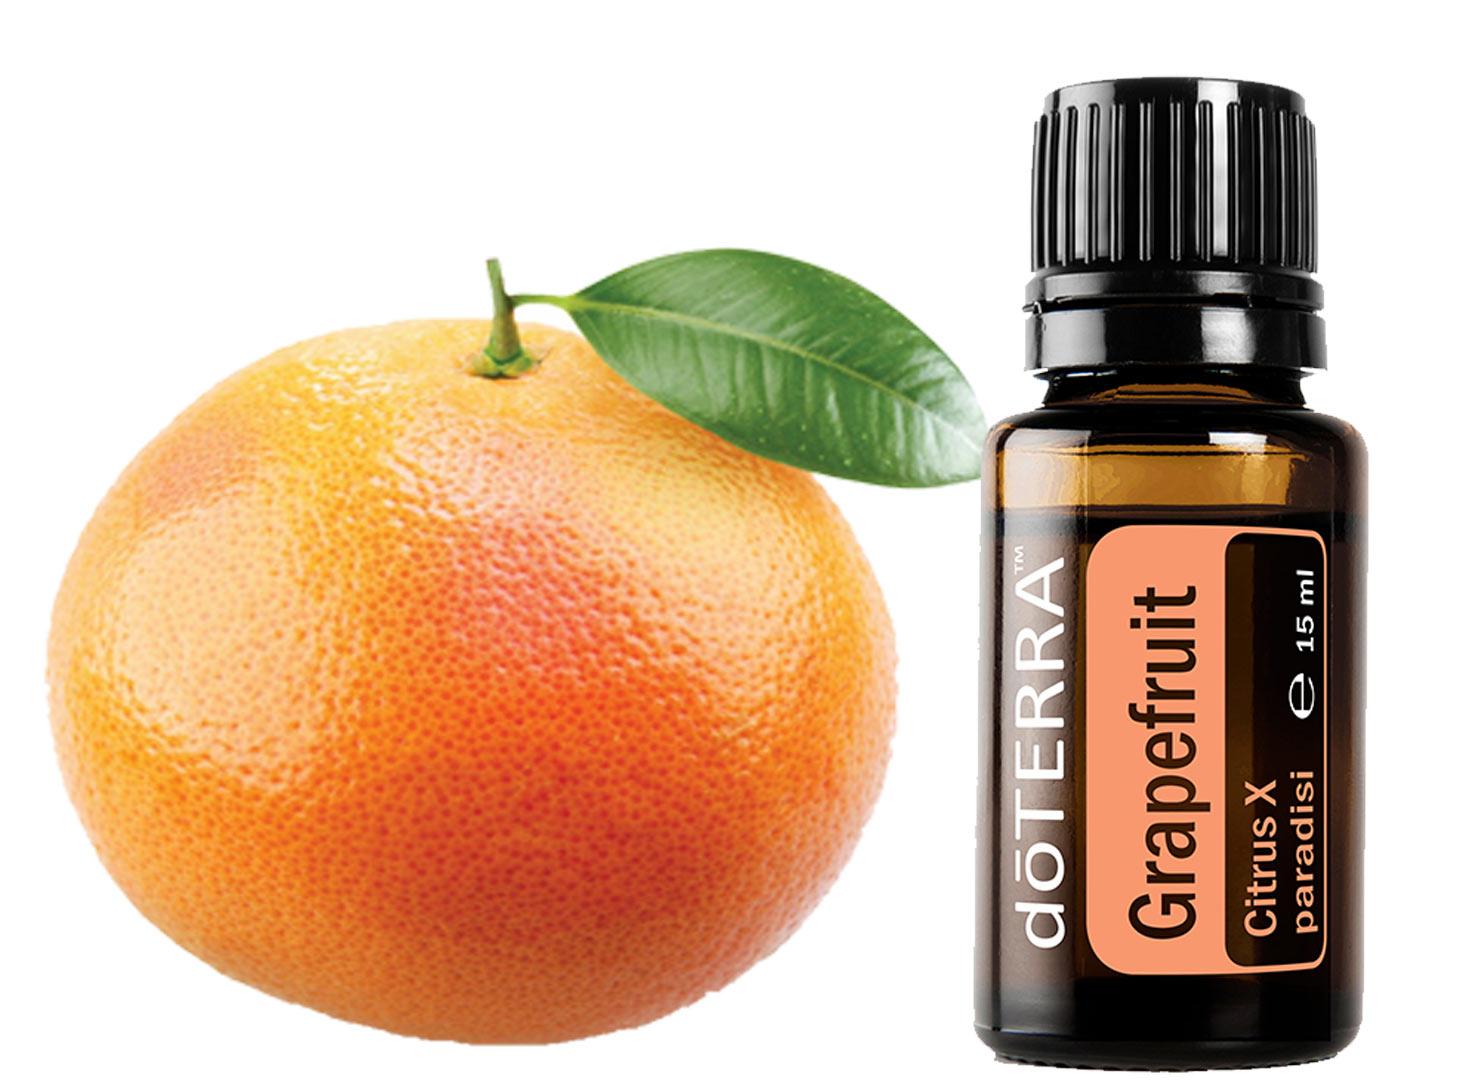 Grapefruit Öl tief einatmen